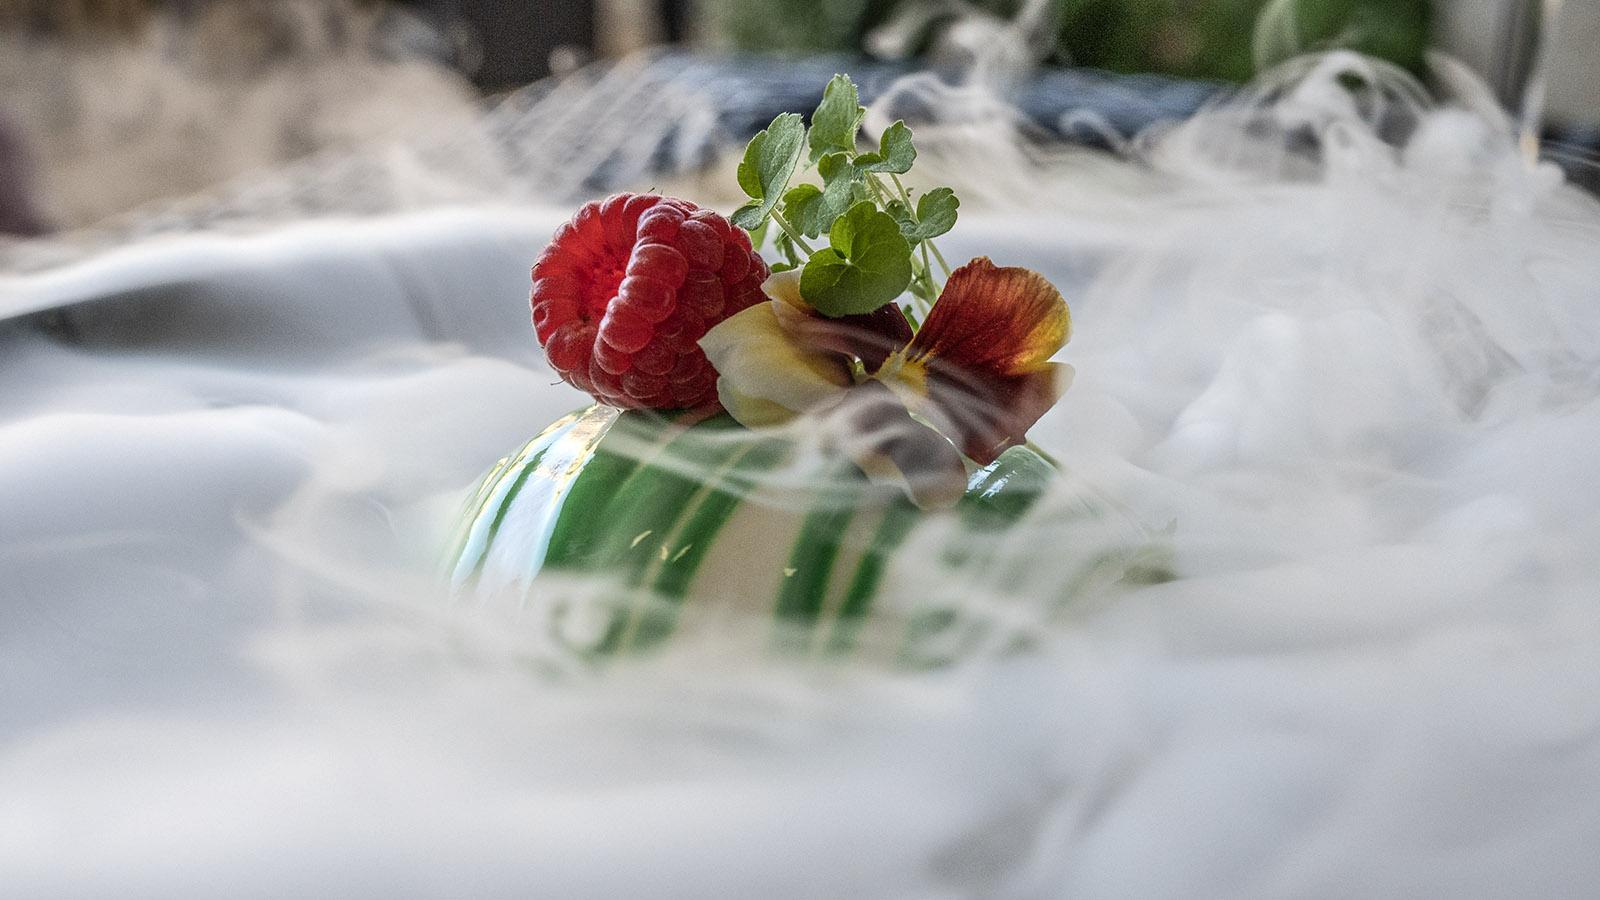 <em>Sapin comtois</em> nennt sich das Dessert, das Stickstoff verzaubert. Foto: Hilke Maunder